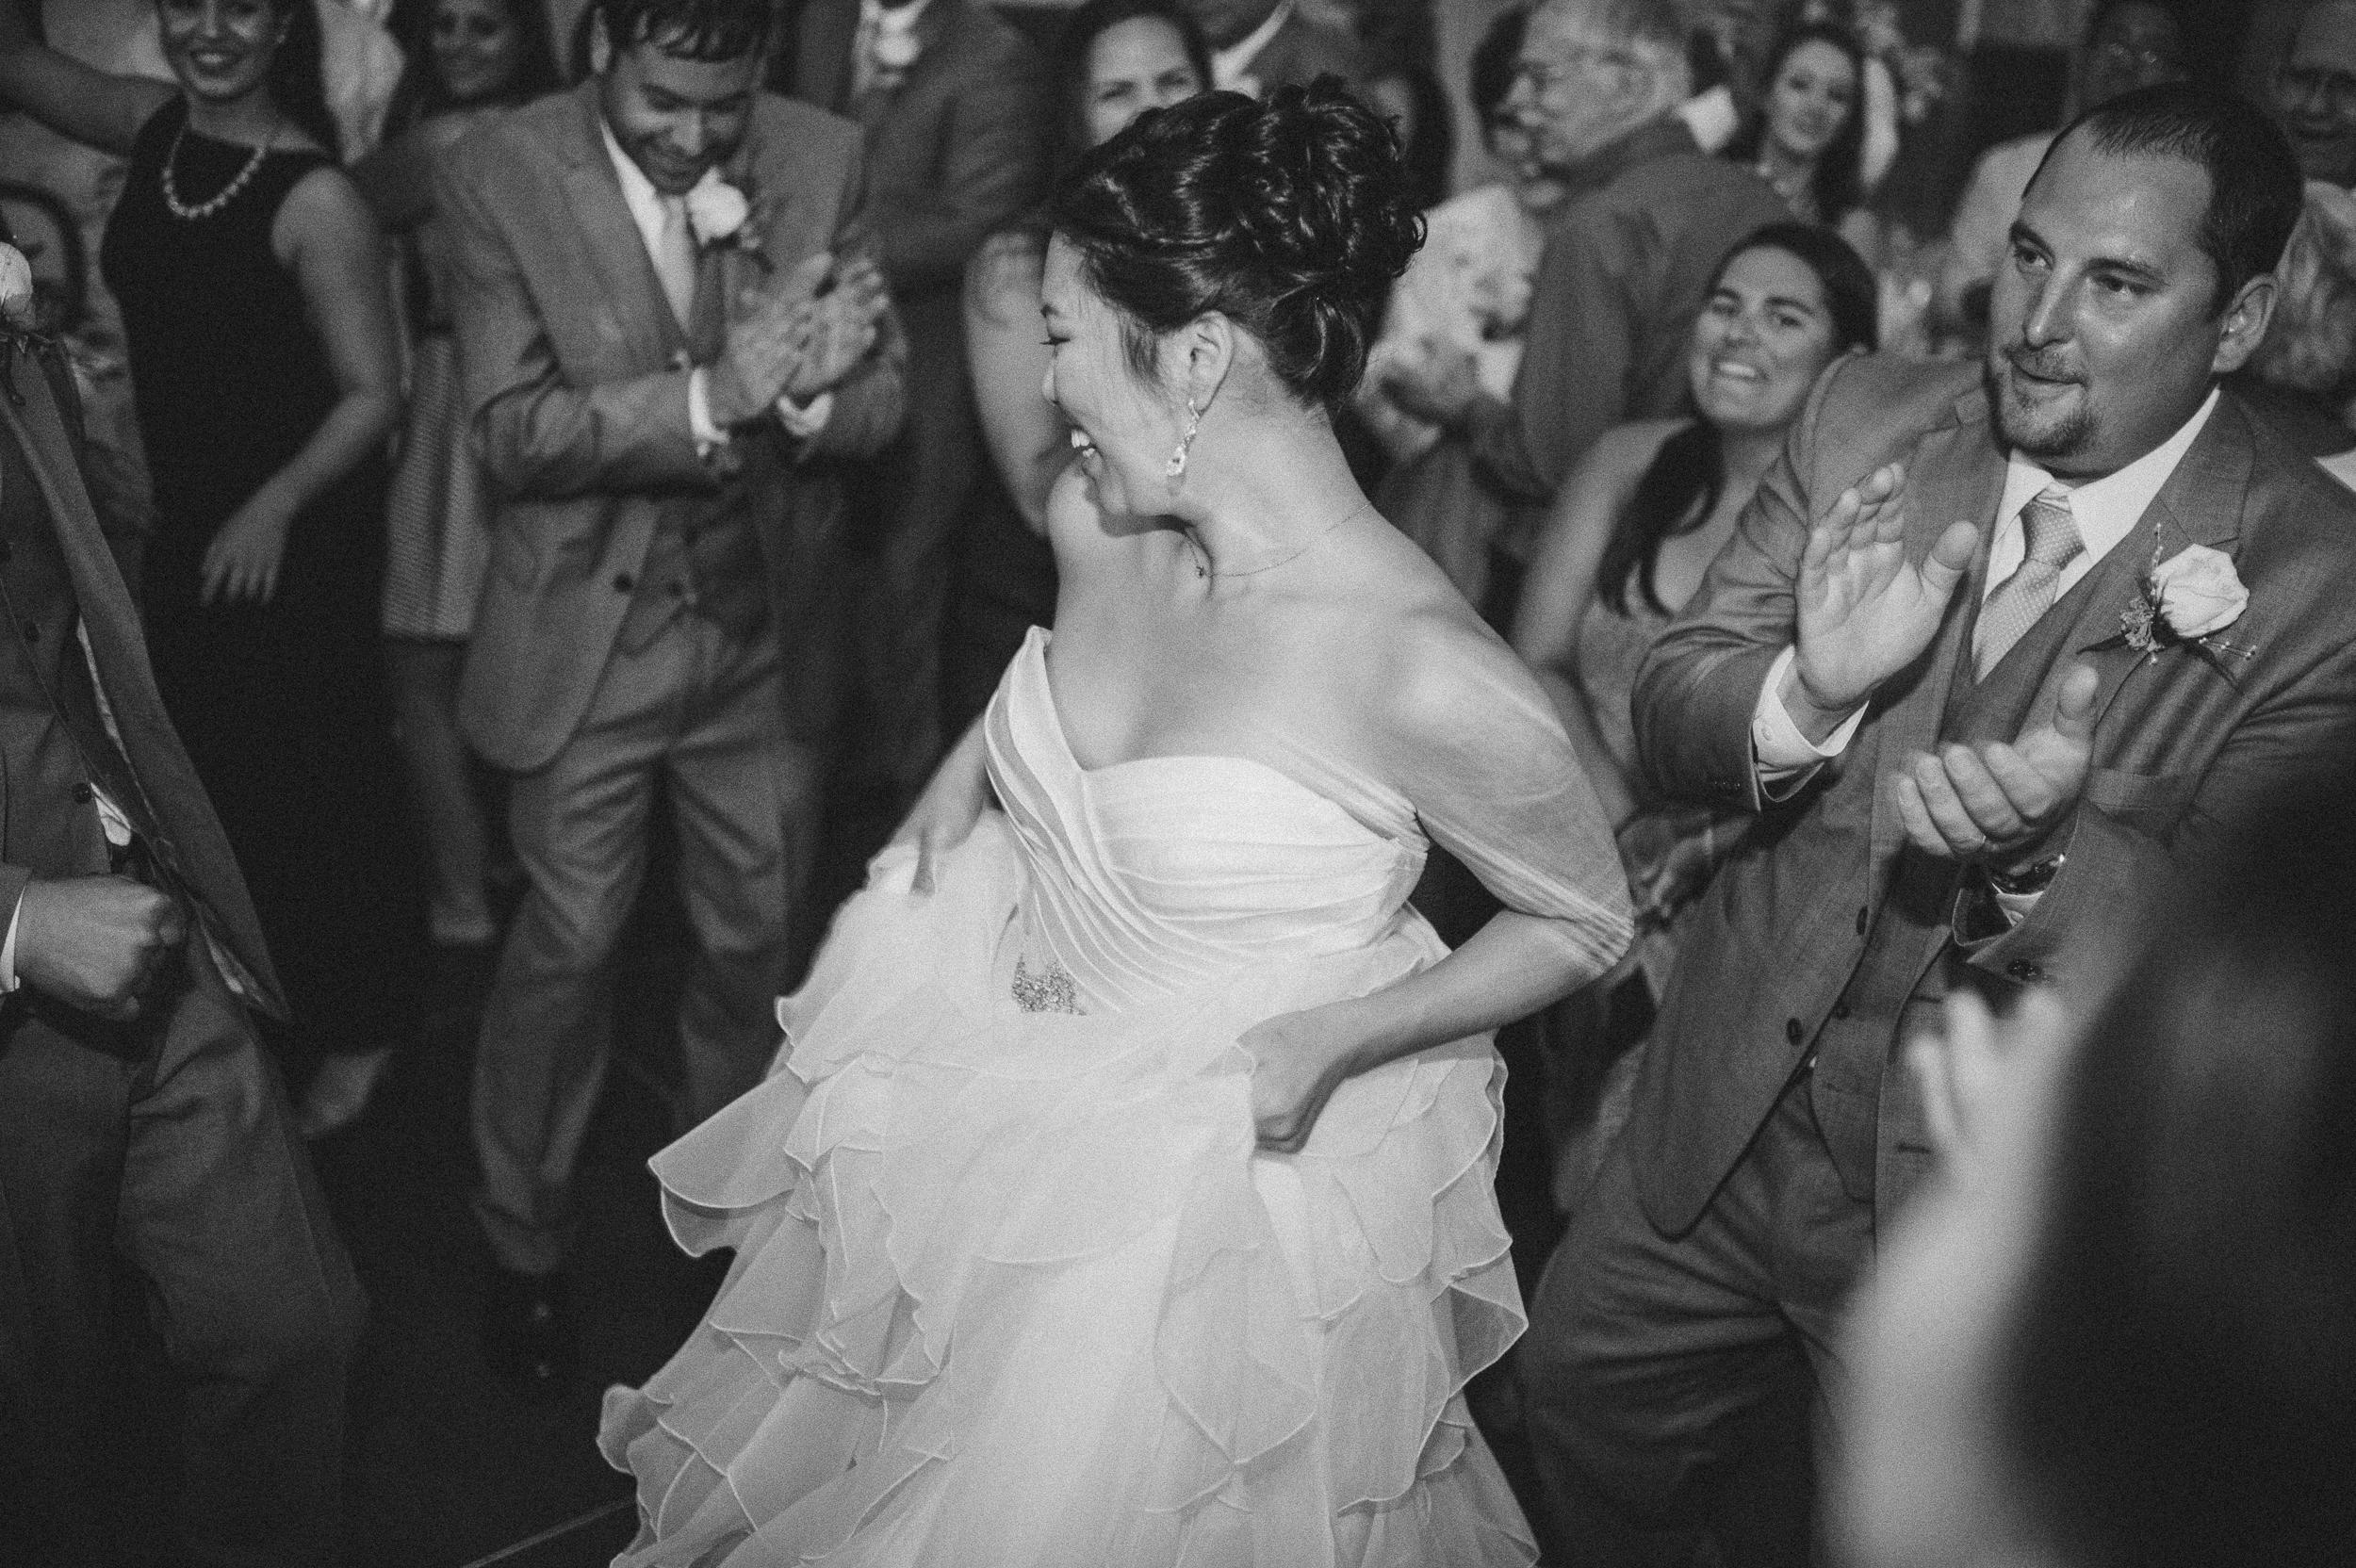 union-trust-philadelphia-wedding-photographer-67.jpg